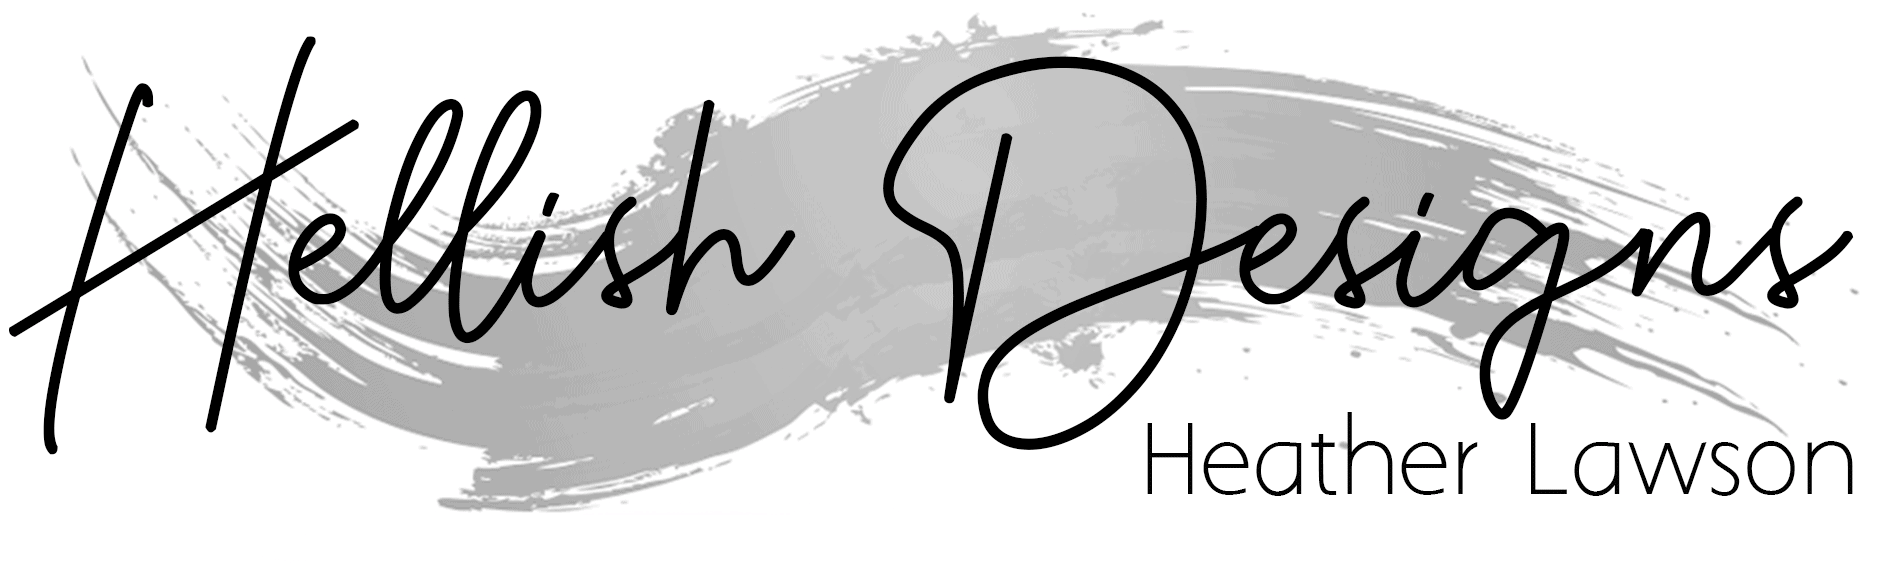 Hellish Designs